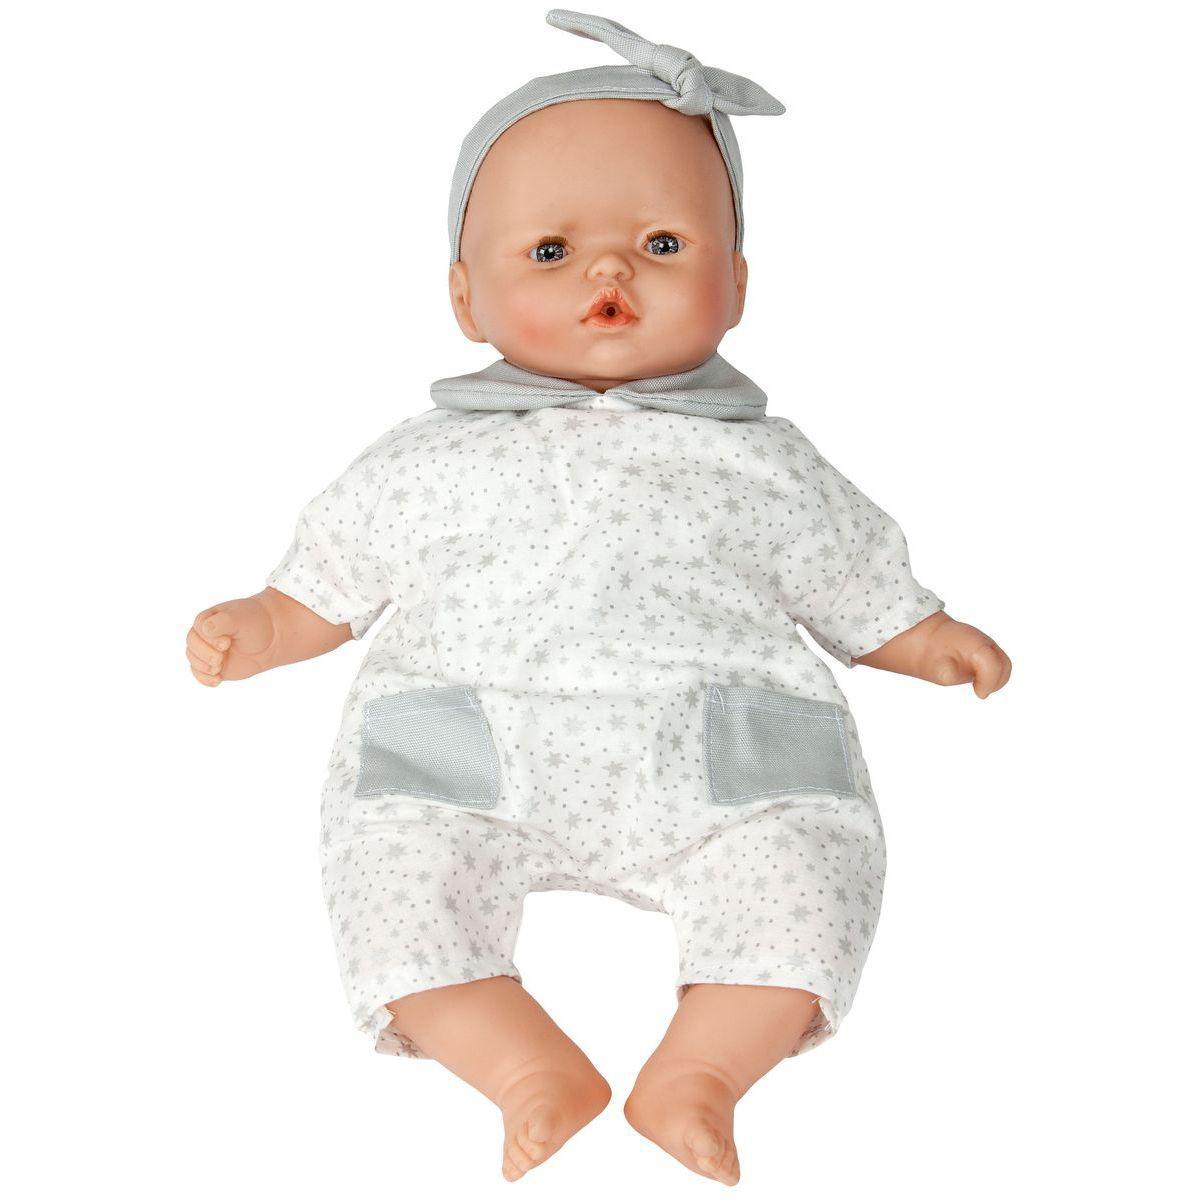 Puppe 36cm STAR Barrutoys grau